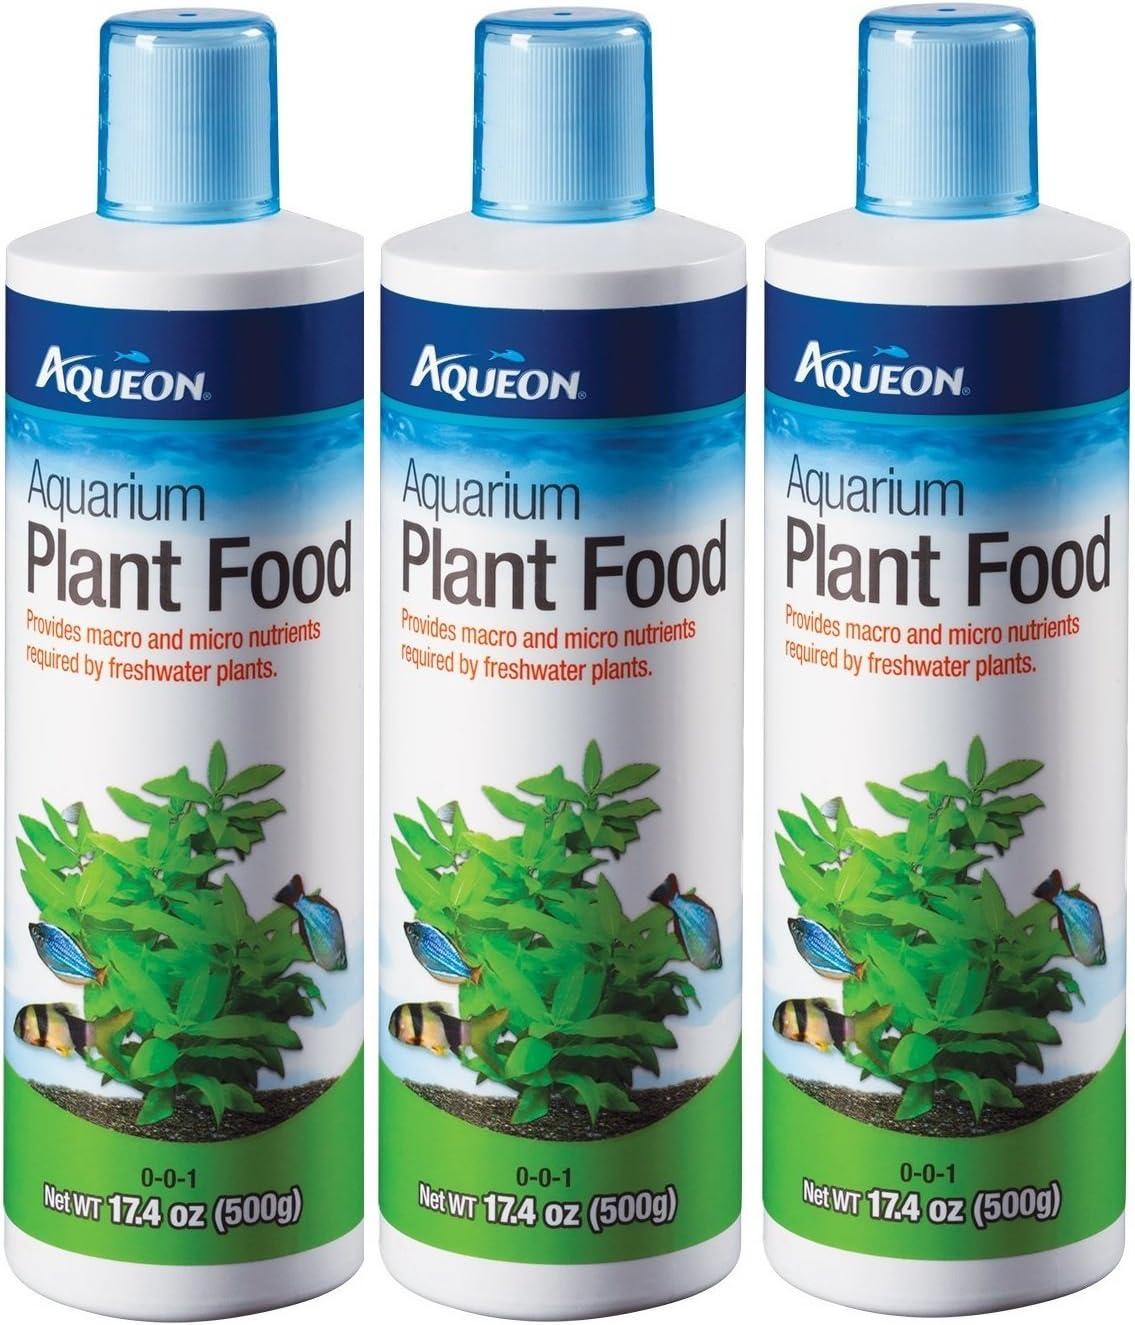 (3 Pack) Aqueon Water Care Aquarium Plant Food, 17.4-Ounce